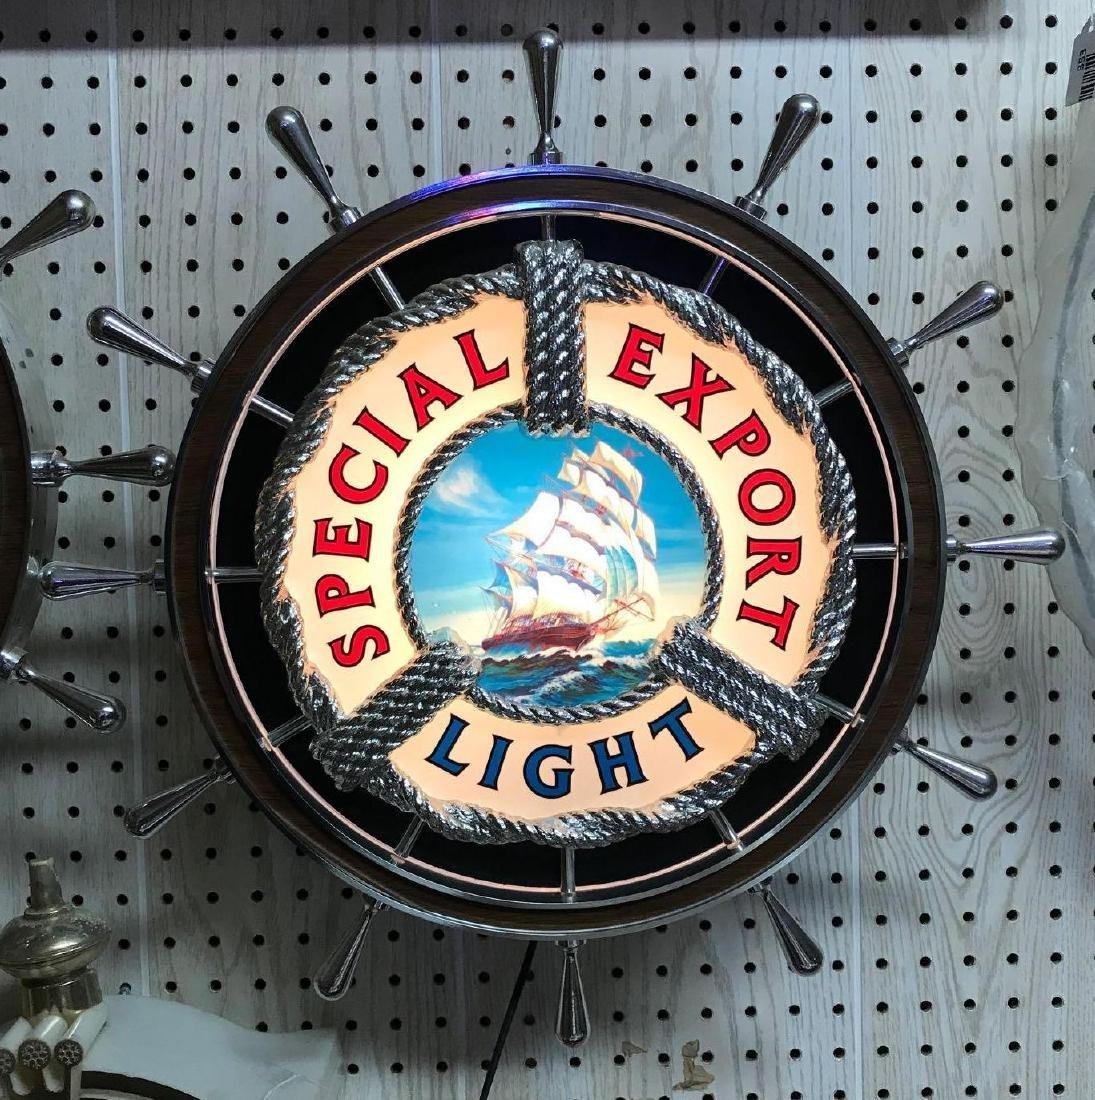 Vintage special export light light up advertising beer